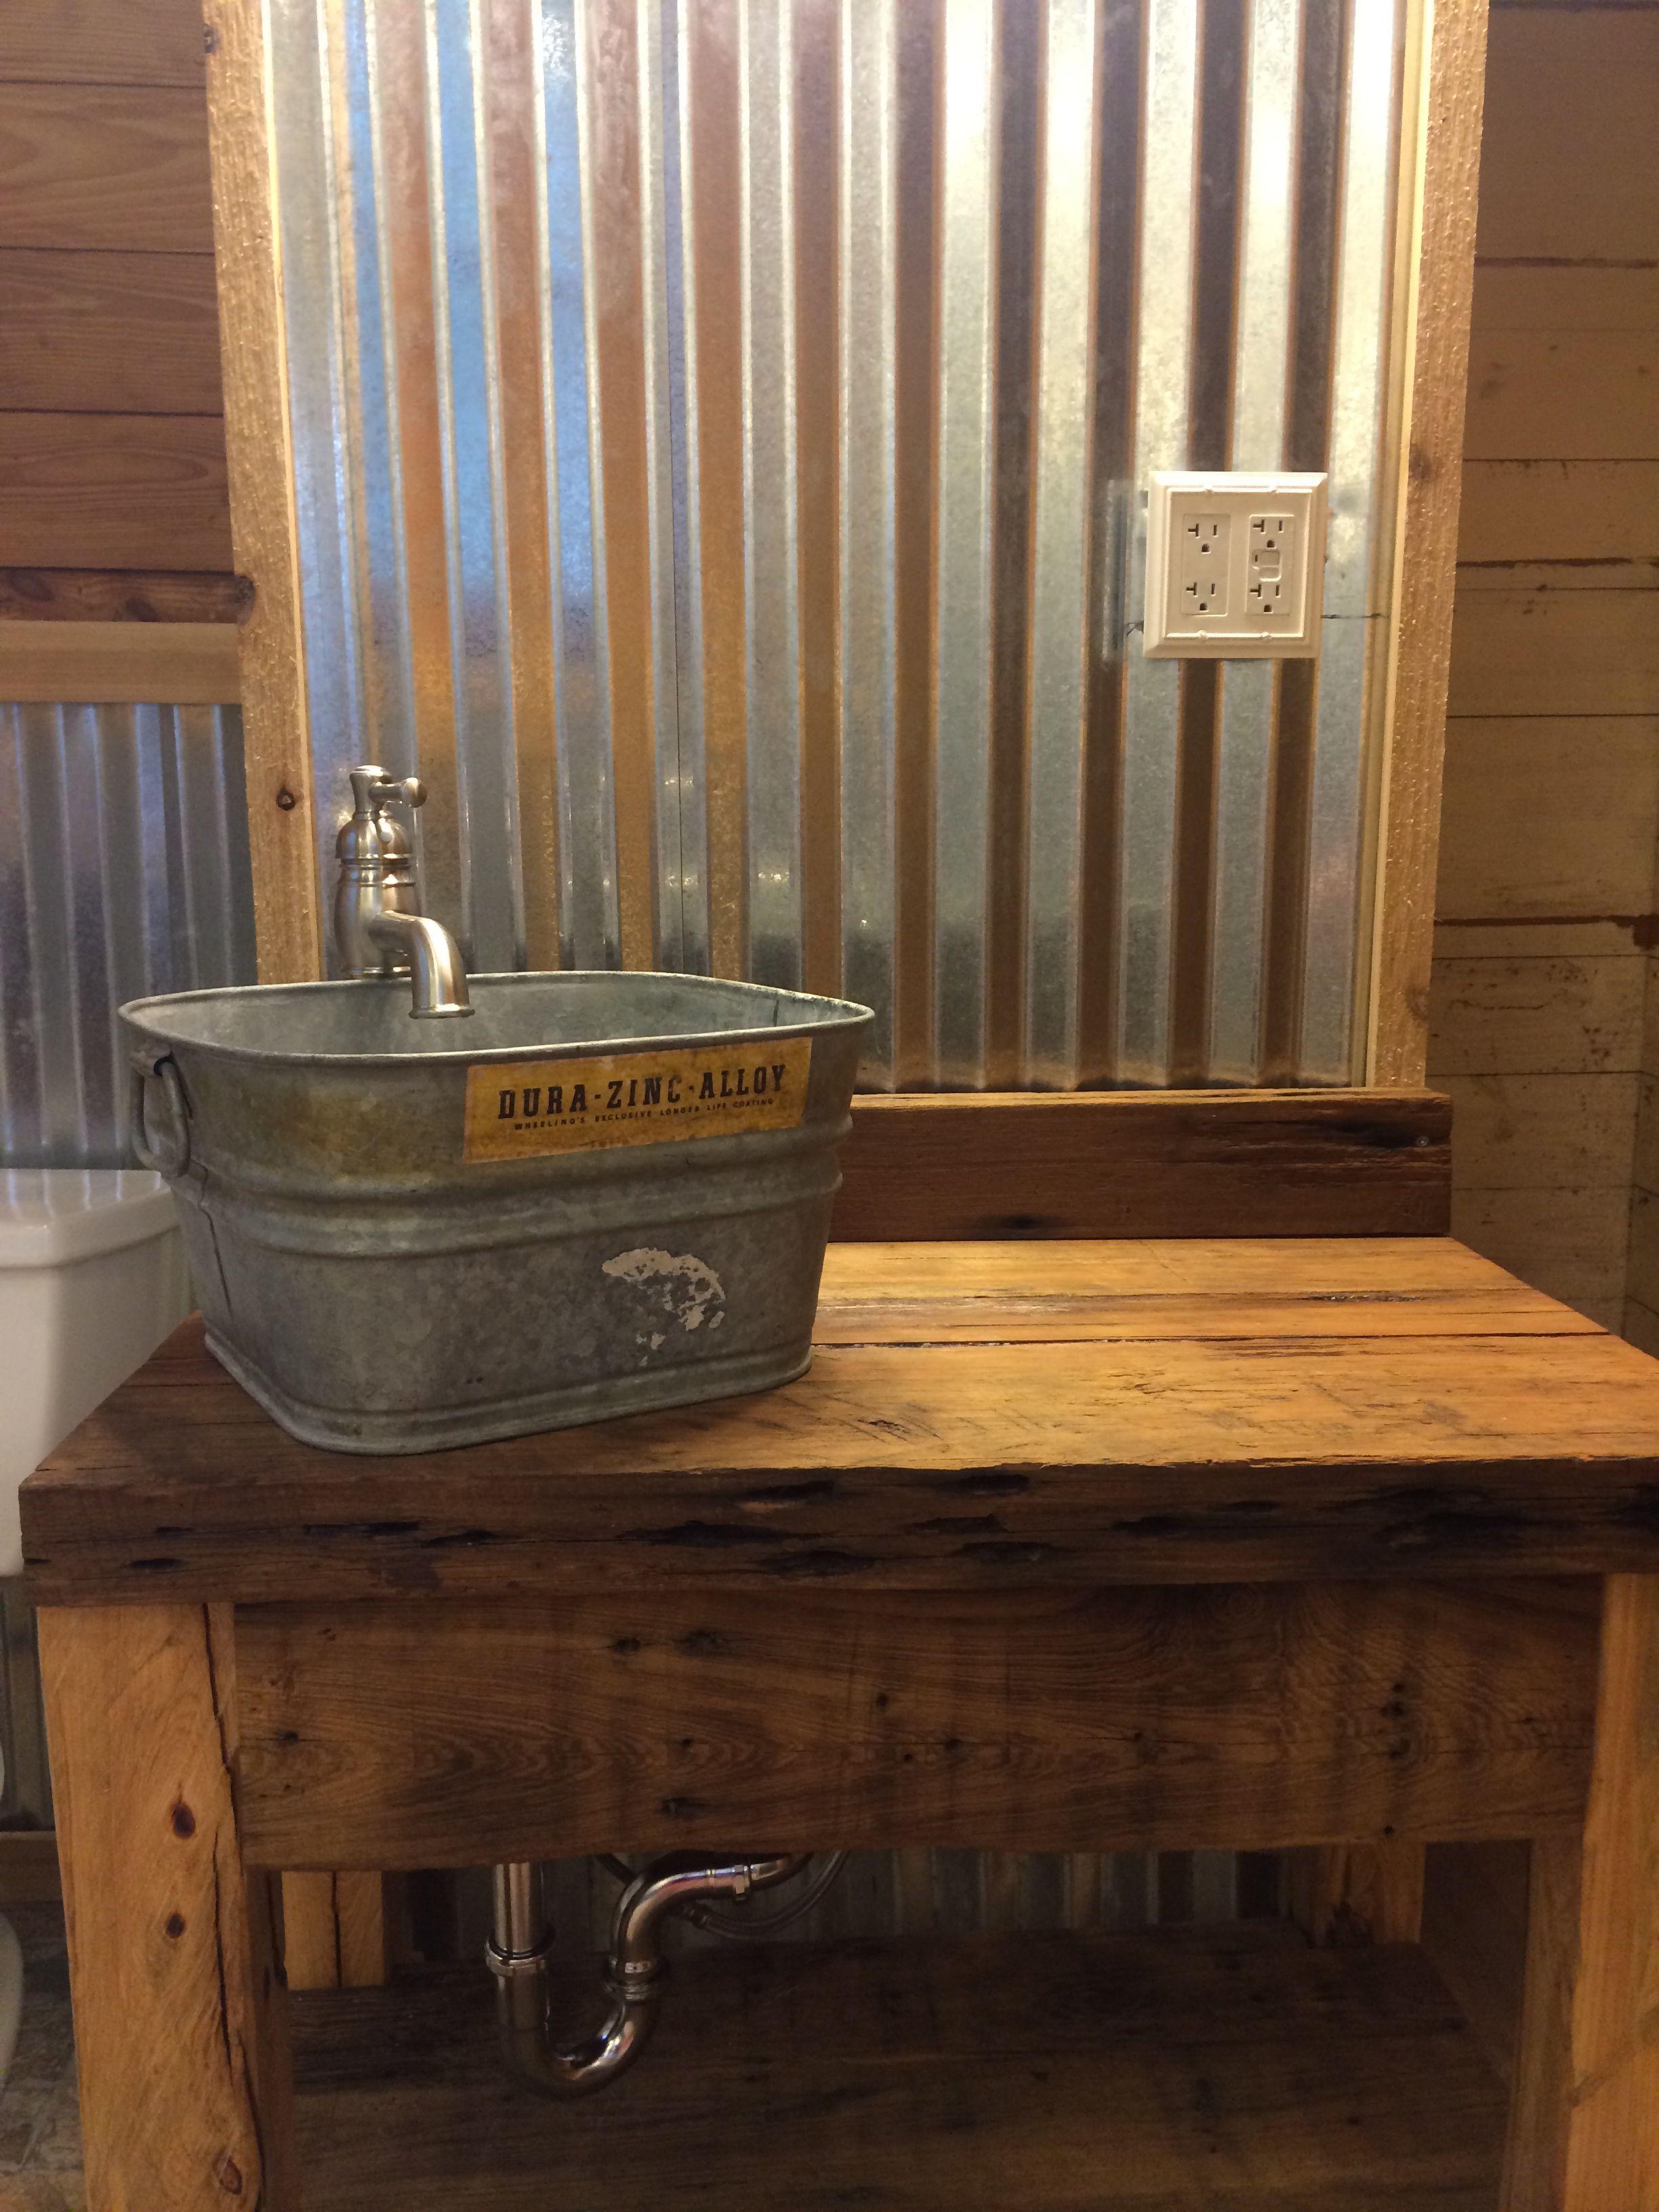 Corrugated Tin Walls With Cypress Vanity And Galvanized Bucket Rustic Bathrooms Rustic Bathroom Tin Walls